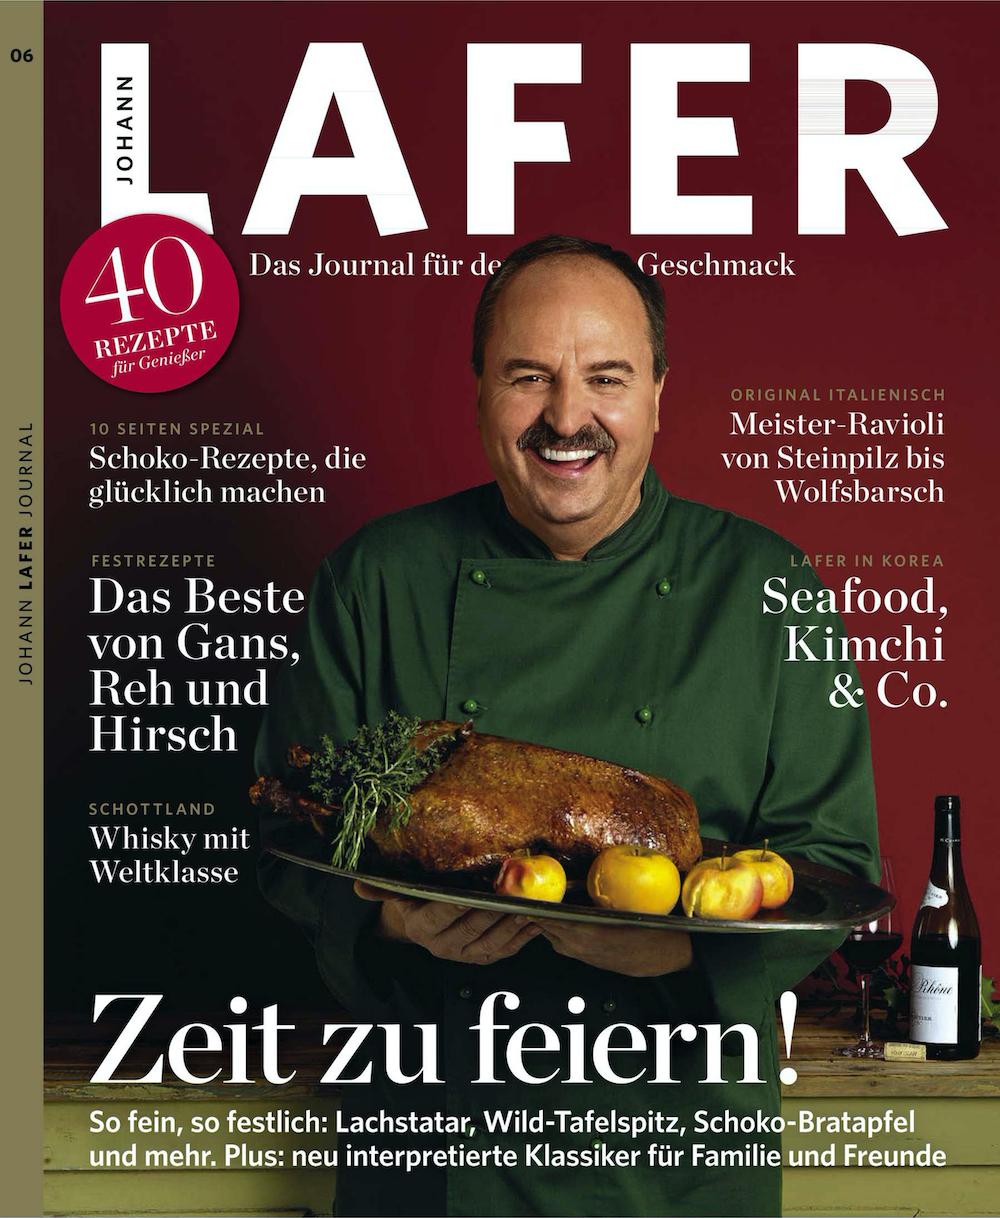 Johann Lafer 2018-06